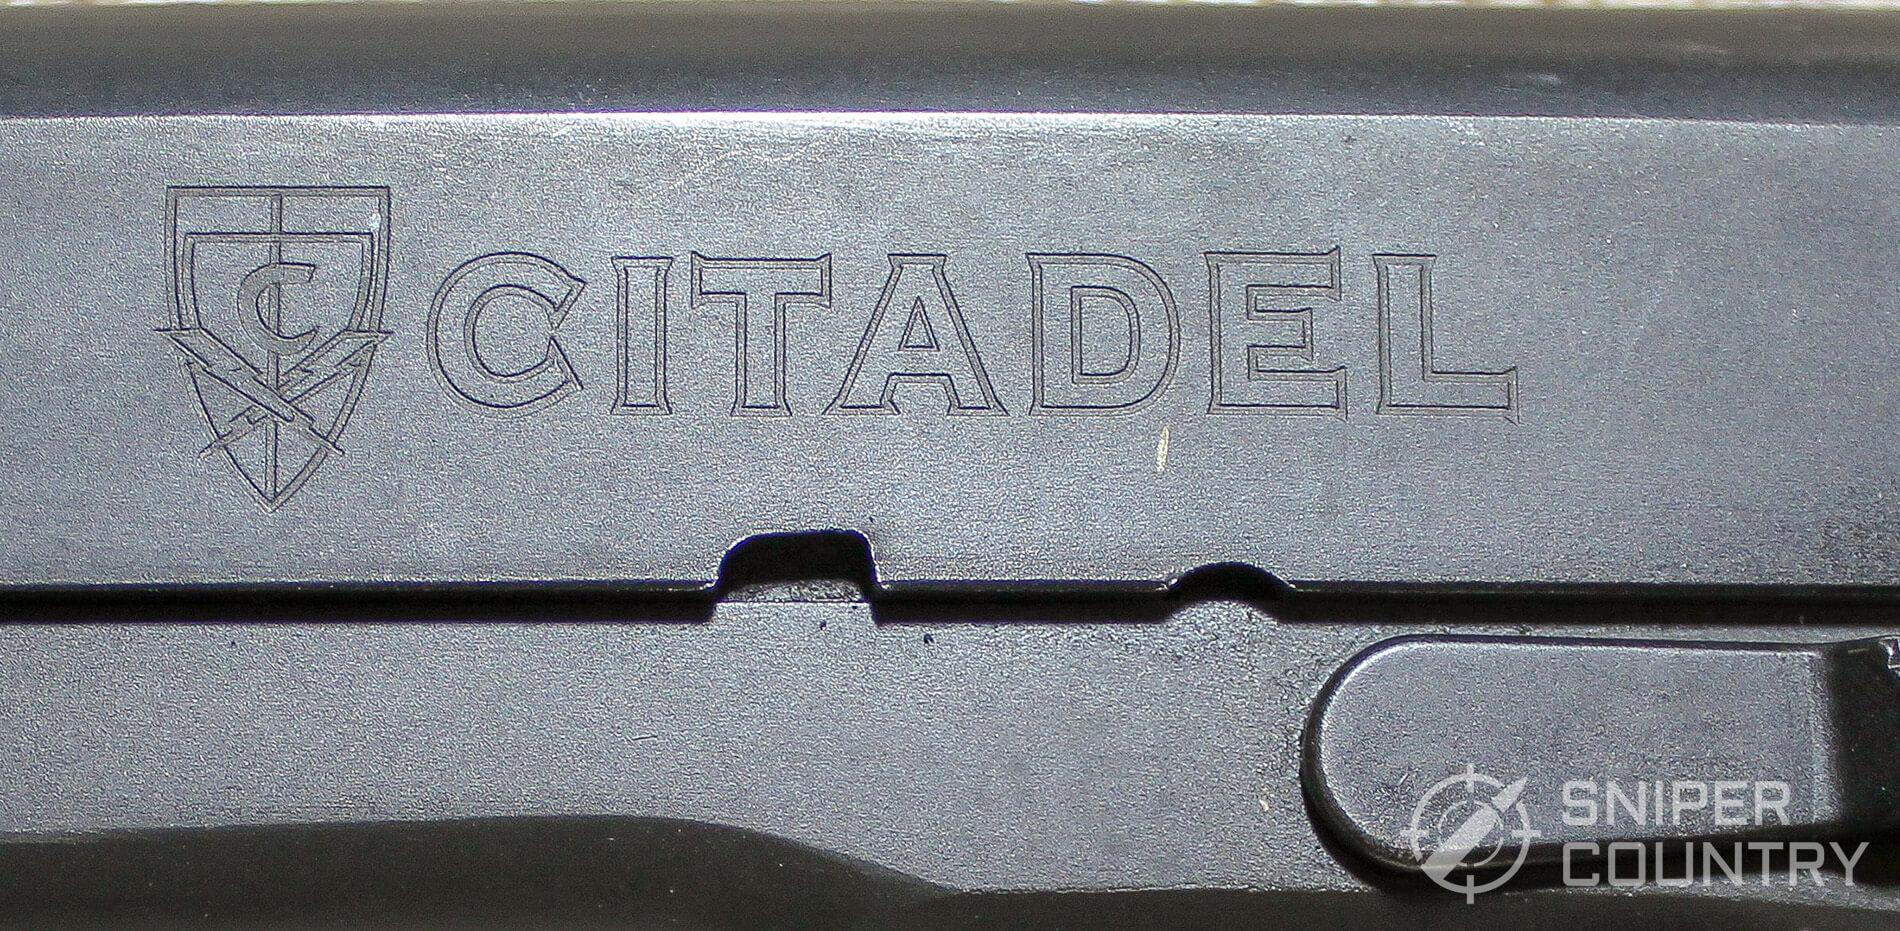 Citadel 1911 left engraving logo